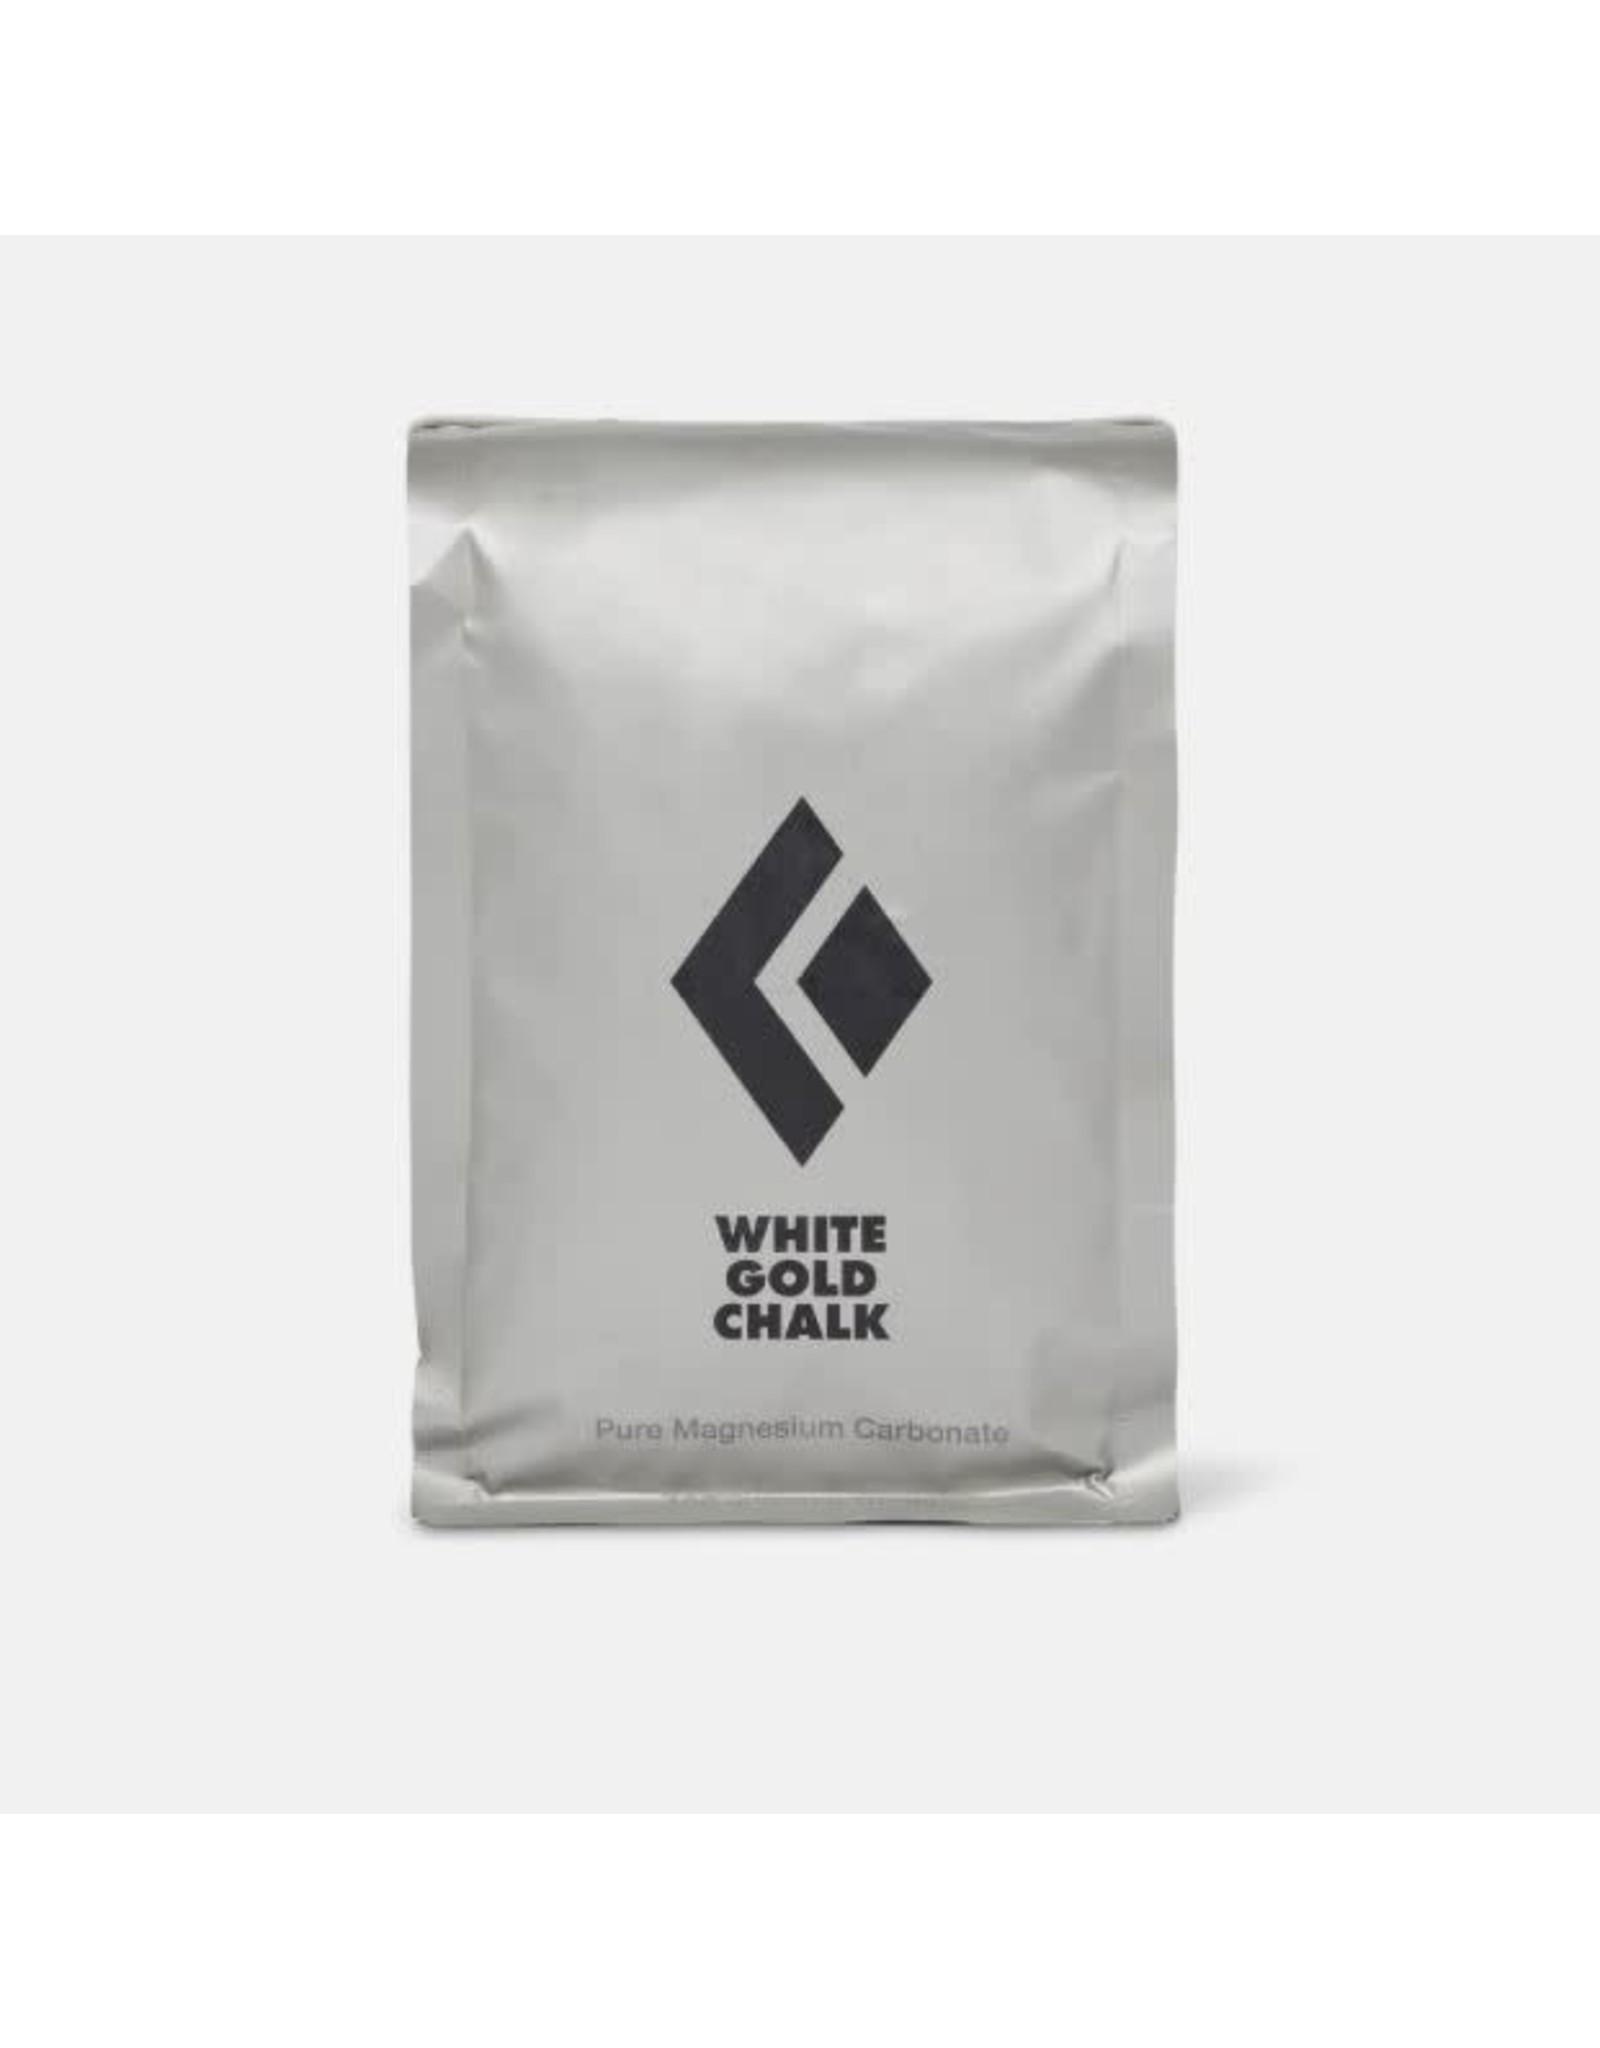 BLACK DIAMOND BLACK DIAMOND LOOSE WHITE GOLD CHALK 100G #BD5505020000ALL1